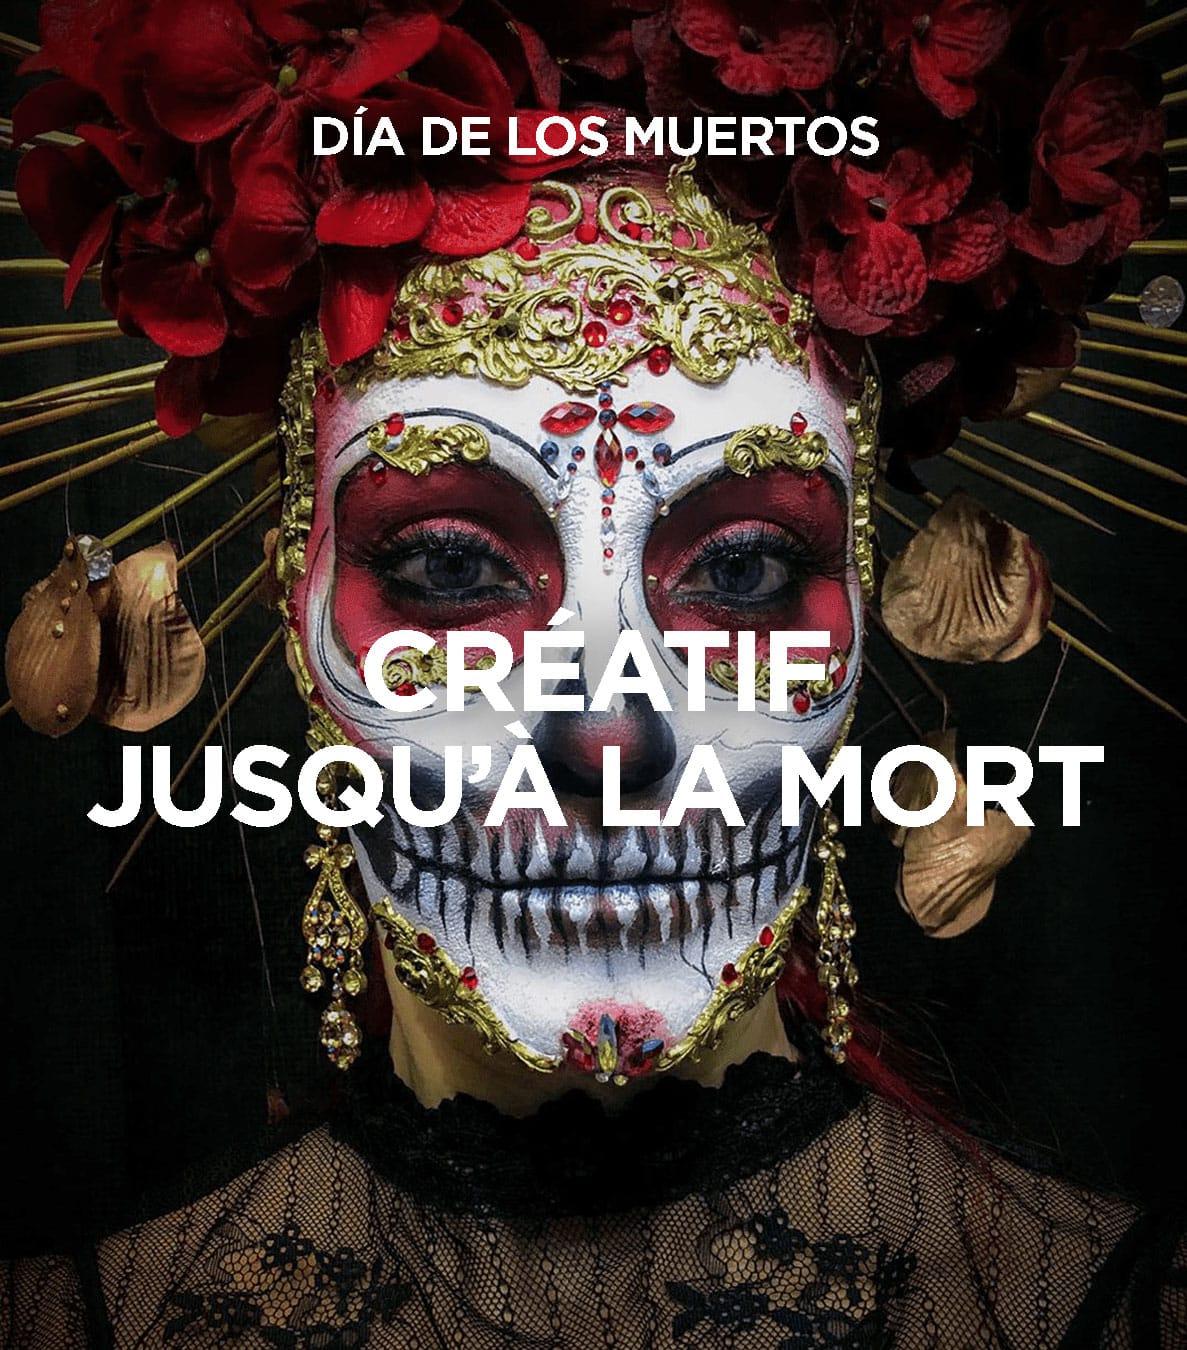 Día De Los Muertos – Les Créatifs De La Mort